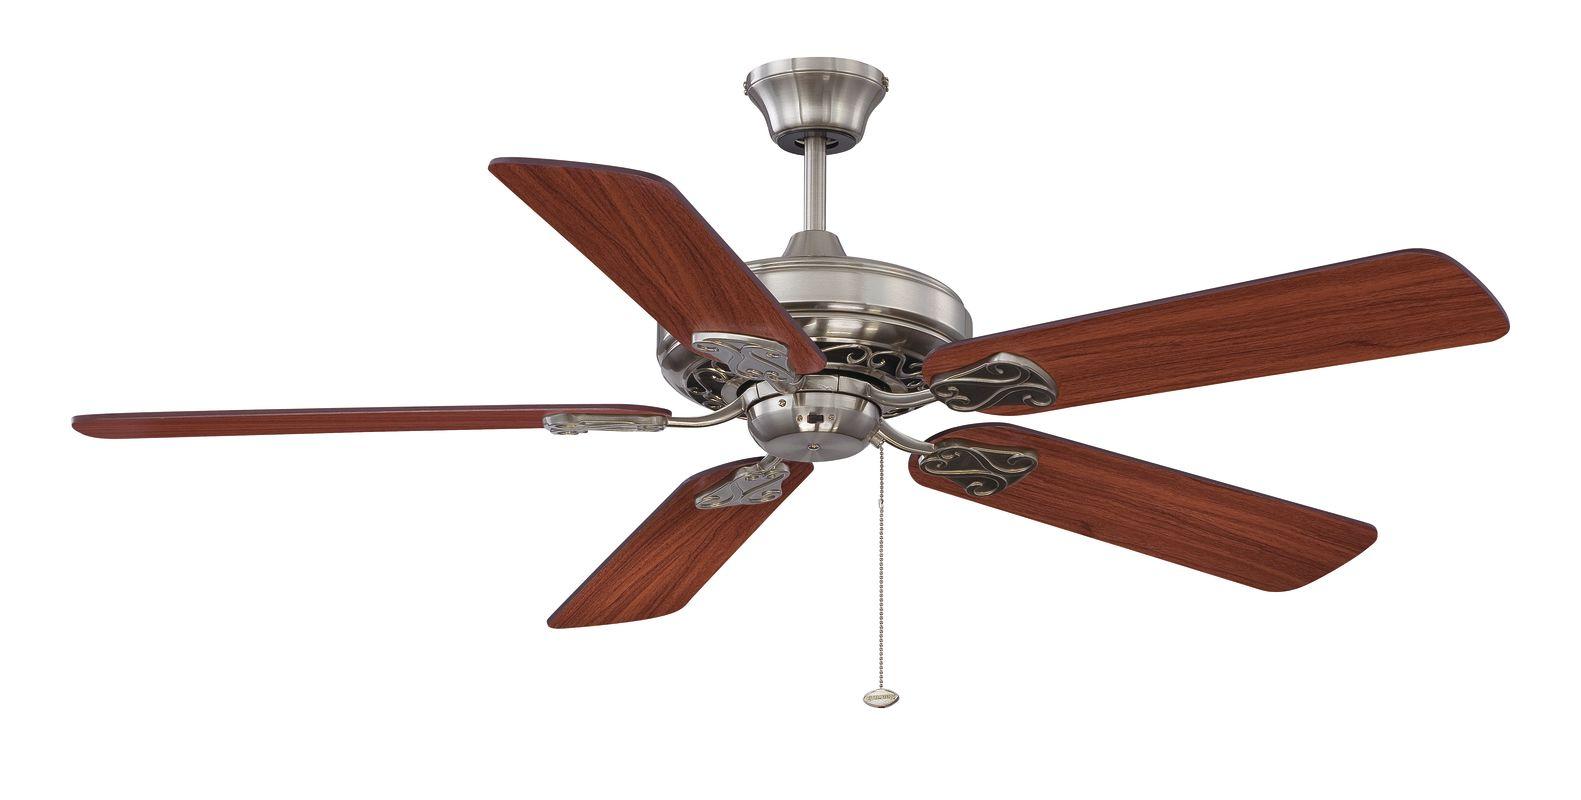 "Ellington Fans Majestic Classic 52"" 5 Blade Indoor Ceiling Fan -"